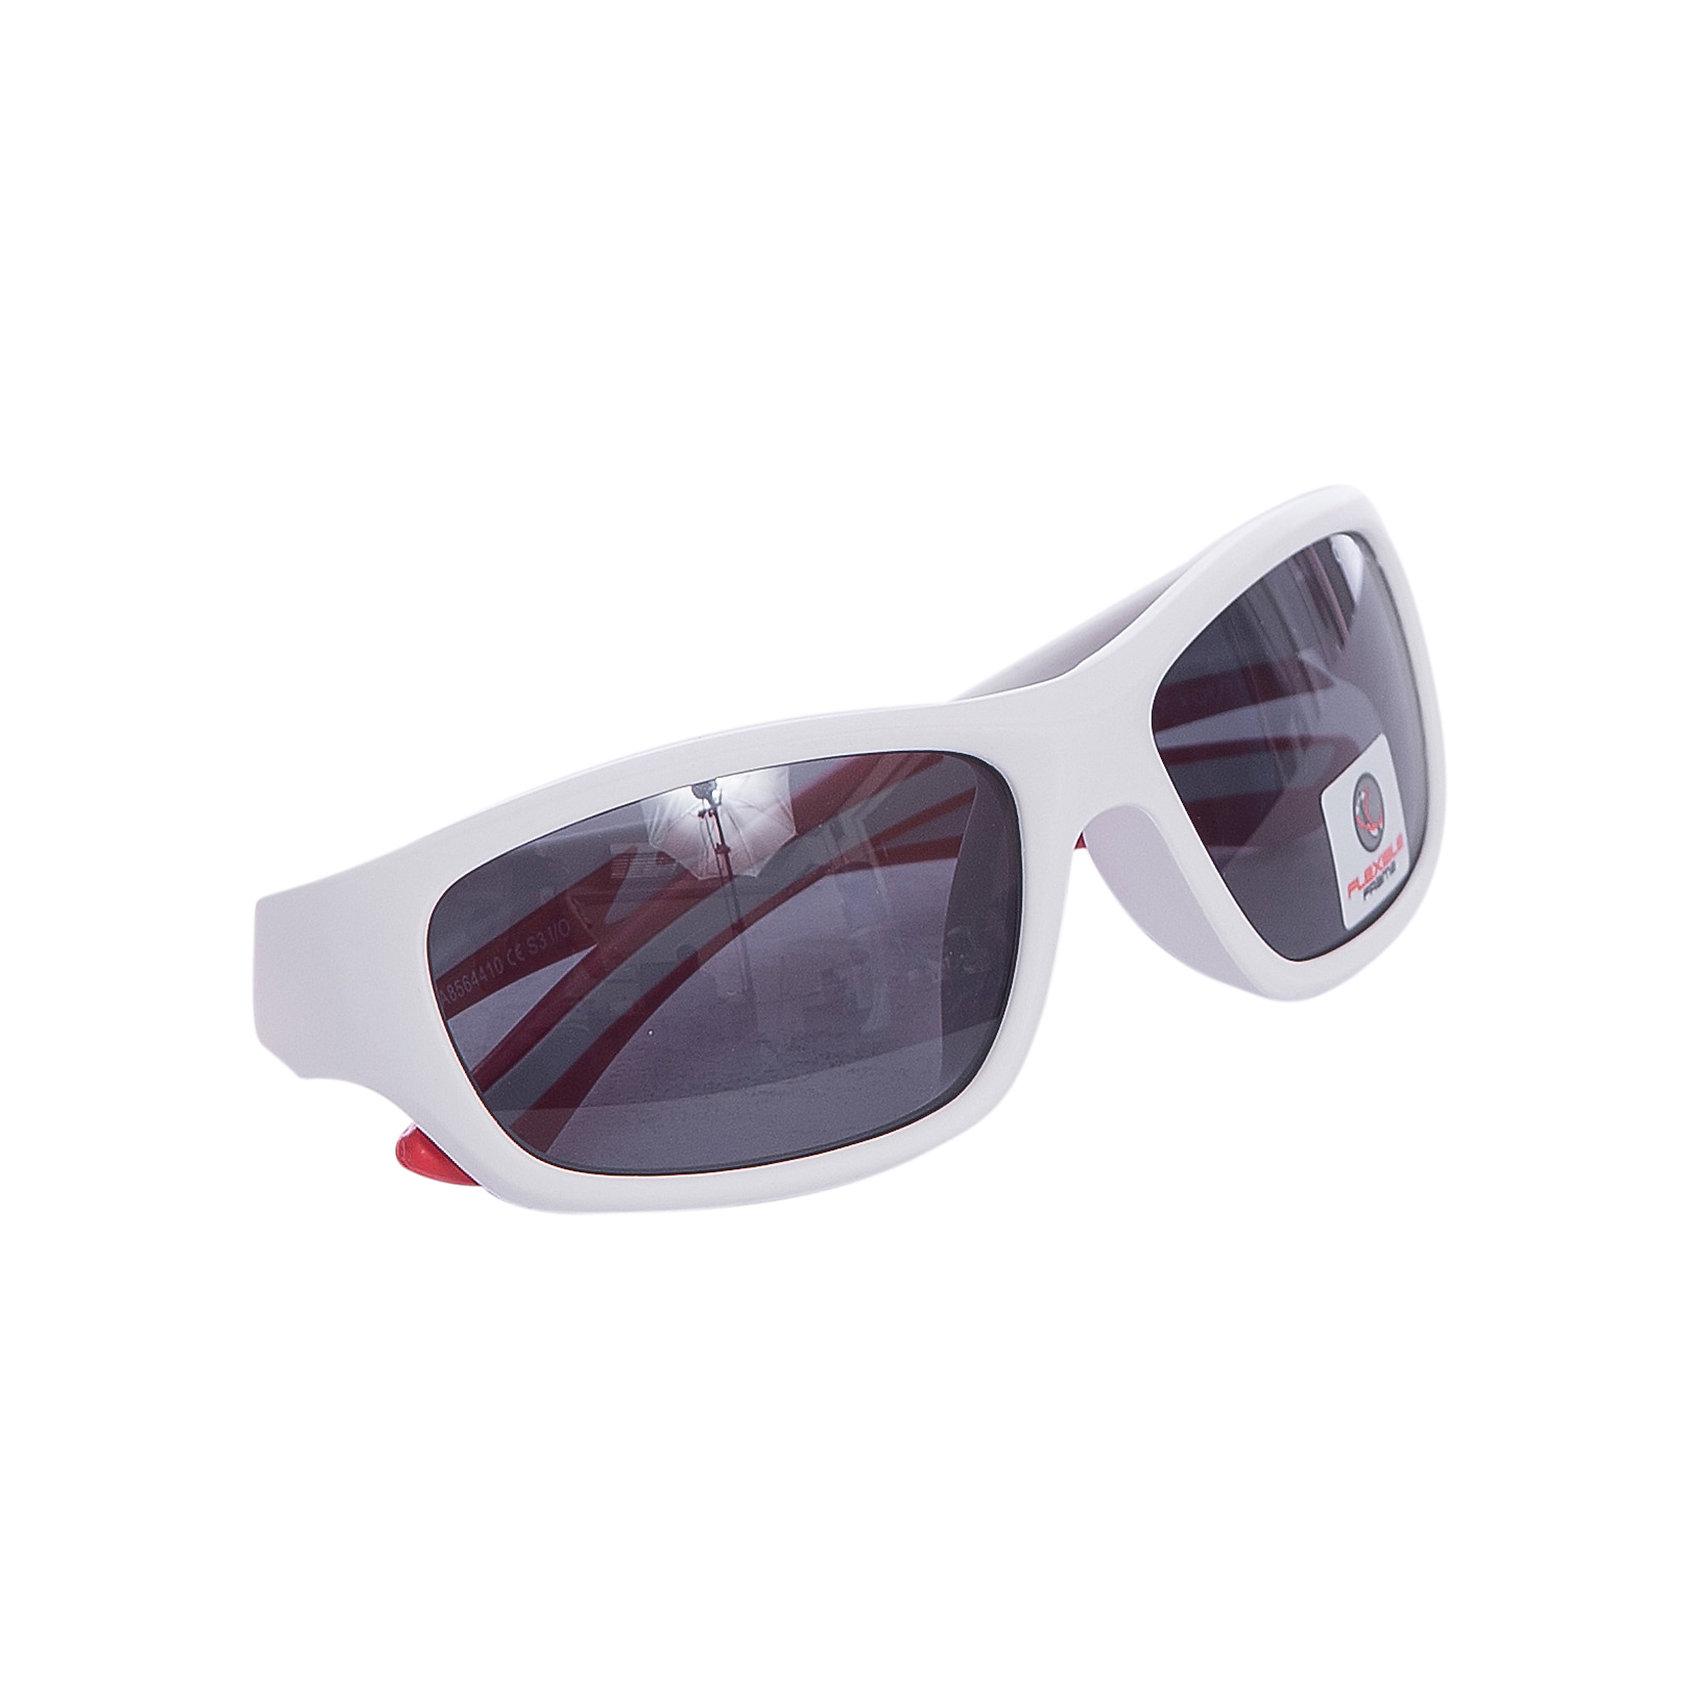 Очки солнцезащитные FLEXXY YOUTH, белые, ALPINAСолнцезащитные очки<br><br><br>Ширина мм: 153<br>Глубина мм: 73<br>Высота мм: 45<br>Вес г: 44<br>Цвет: белый<br>Возраст от месяцев: 96<br>Возраст до месяцев: 1164<br>Пол: Унисекс<br>Возраст: Детский<br>SKU: 4467487